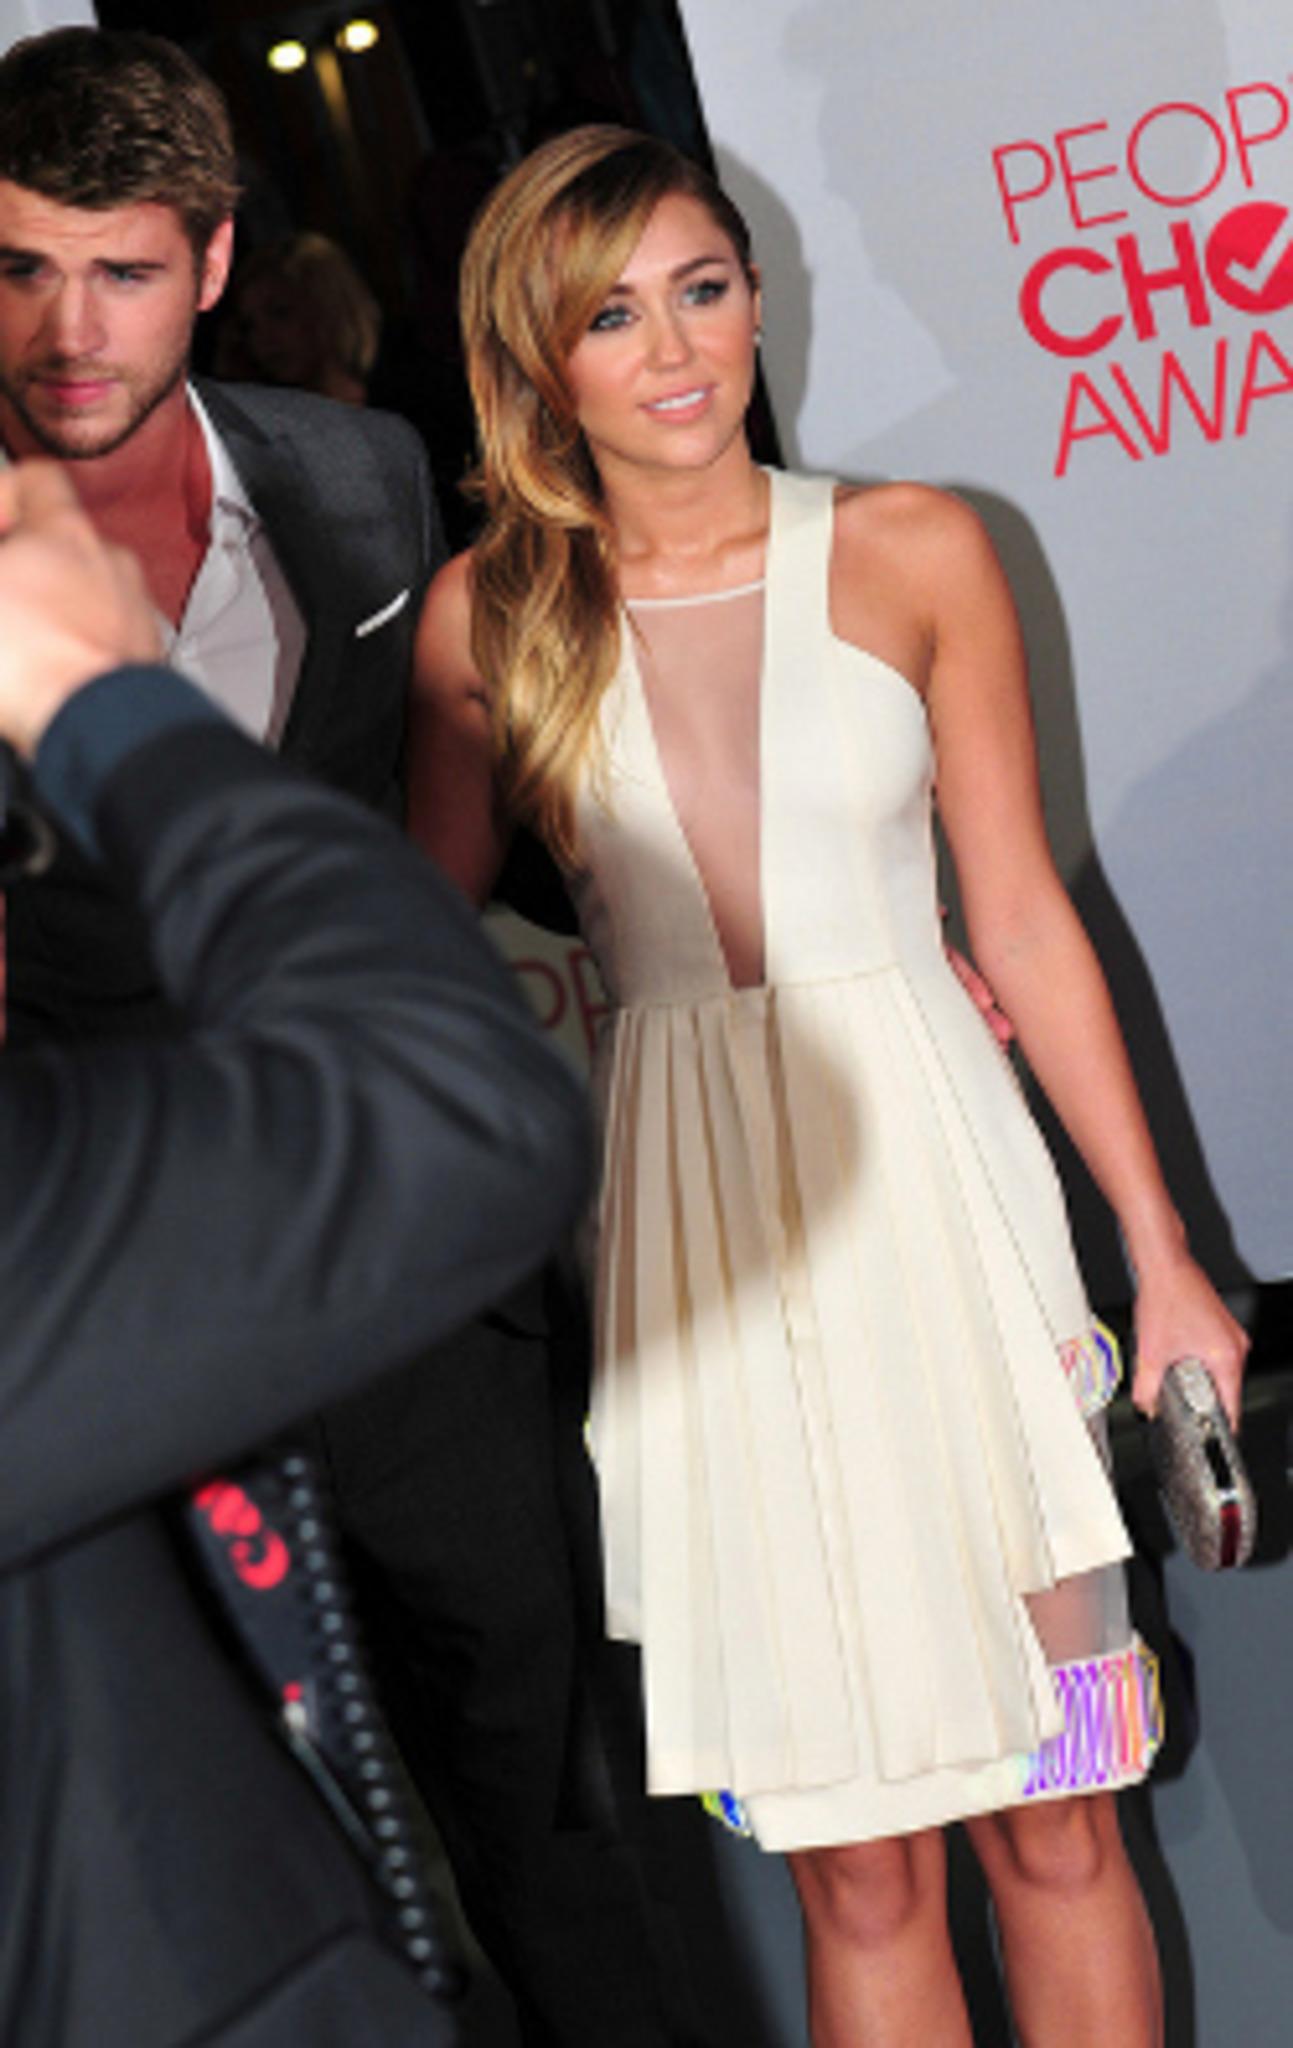 Chris Hemsworth Freundin